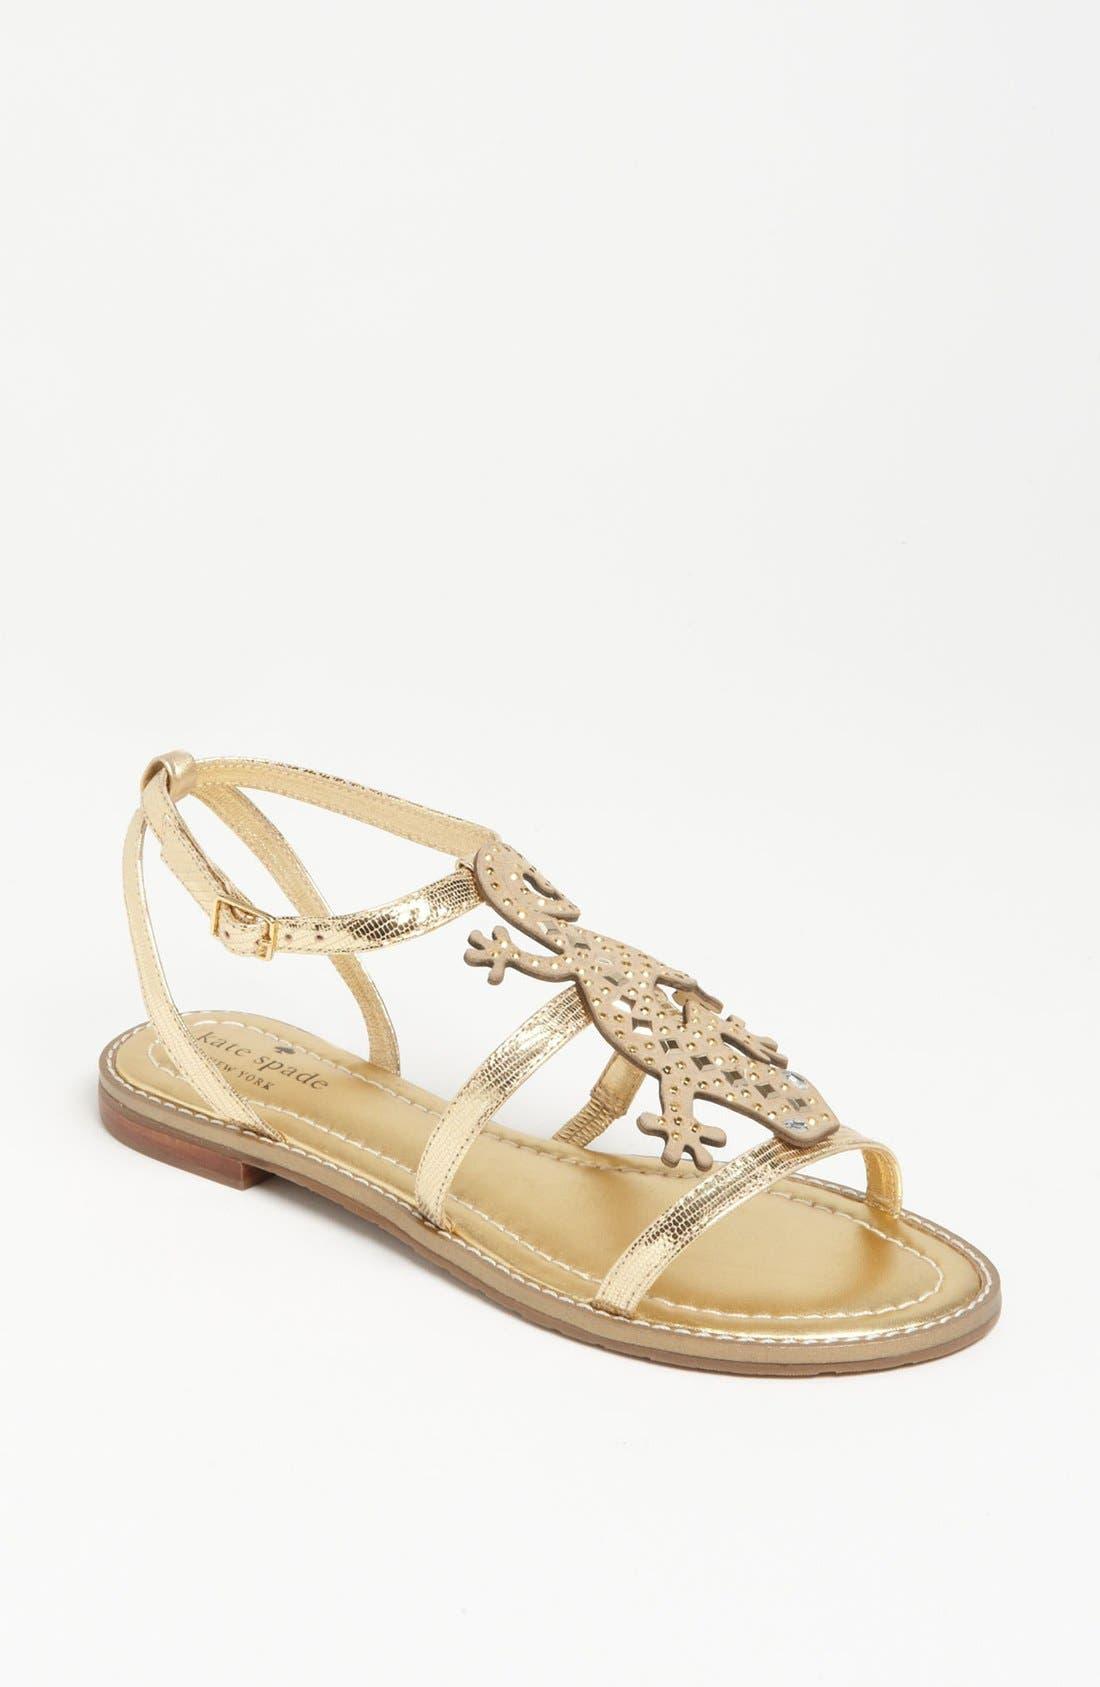 Alternate Image 1 Selected - kate spade new york 'slick' sandal